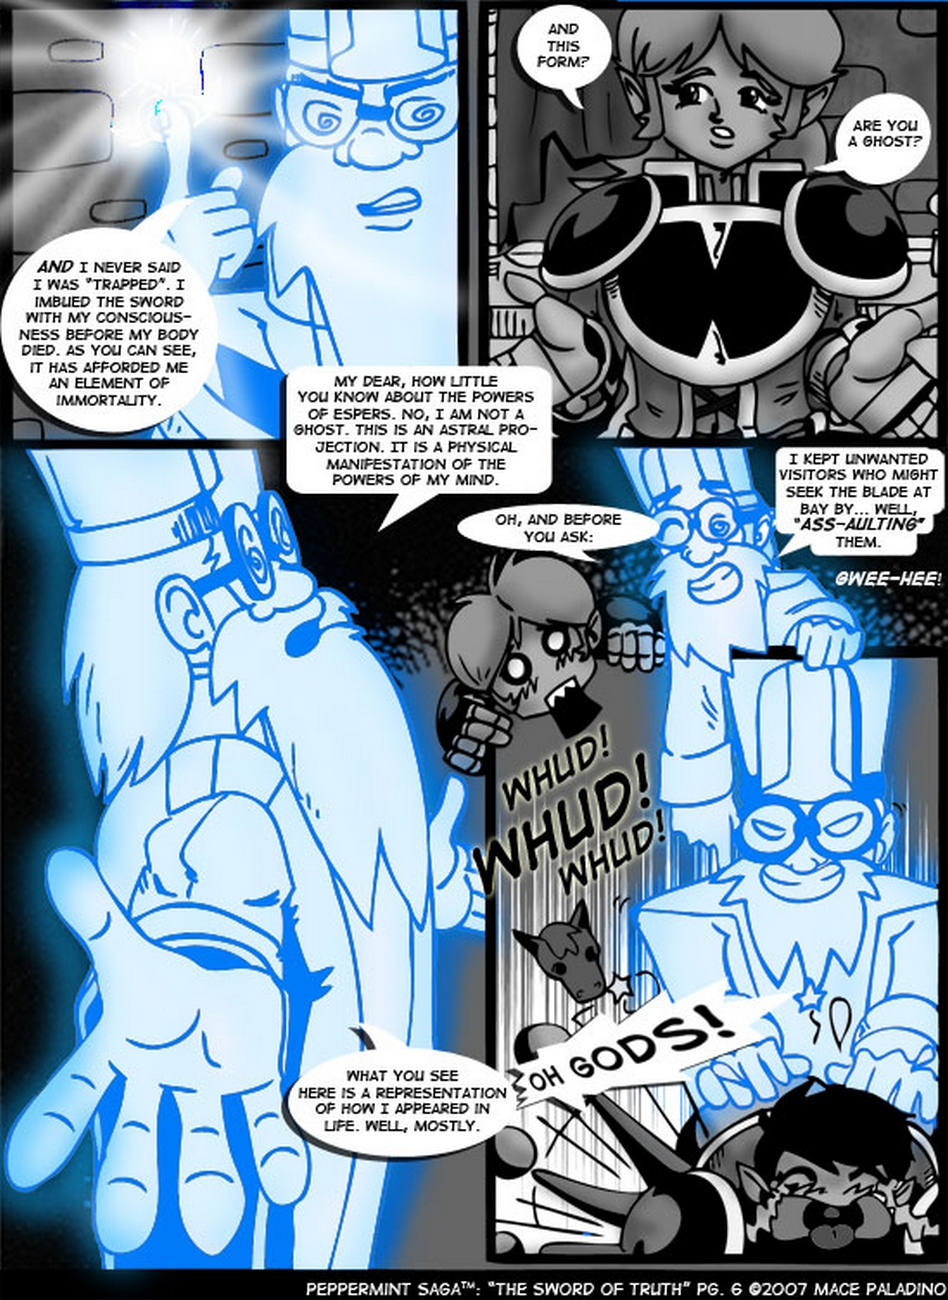 Peppermint-Saga-1-The-Sword-Of-Truth 8 free sex comic